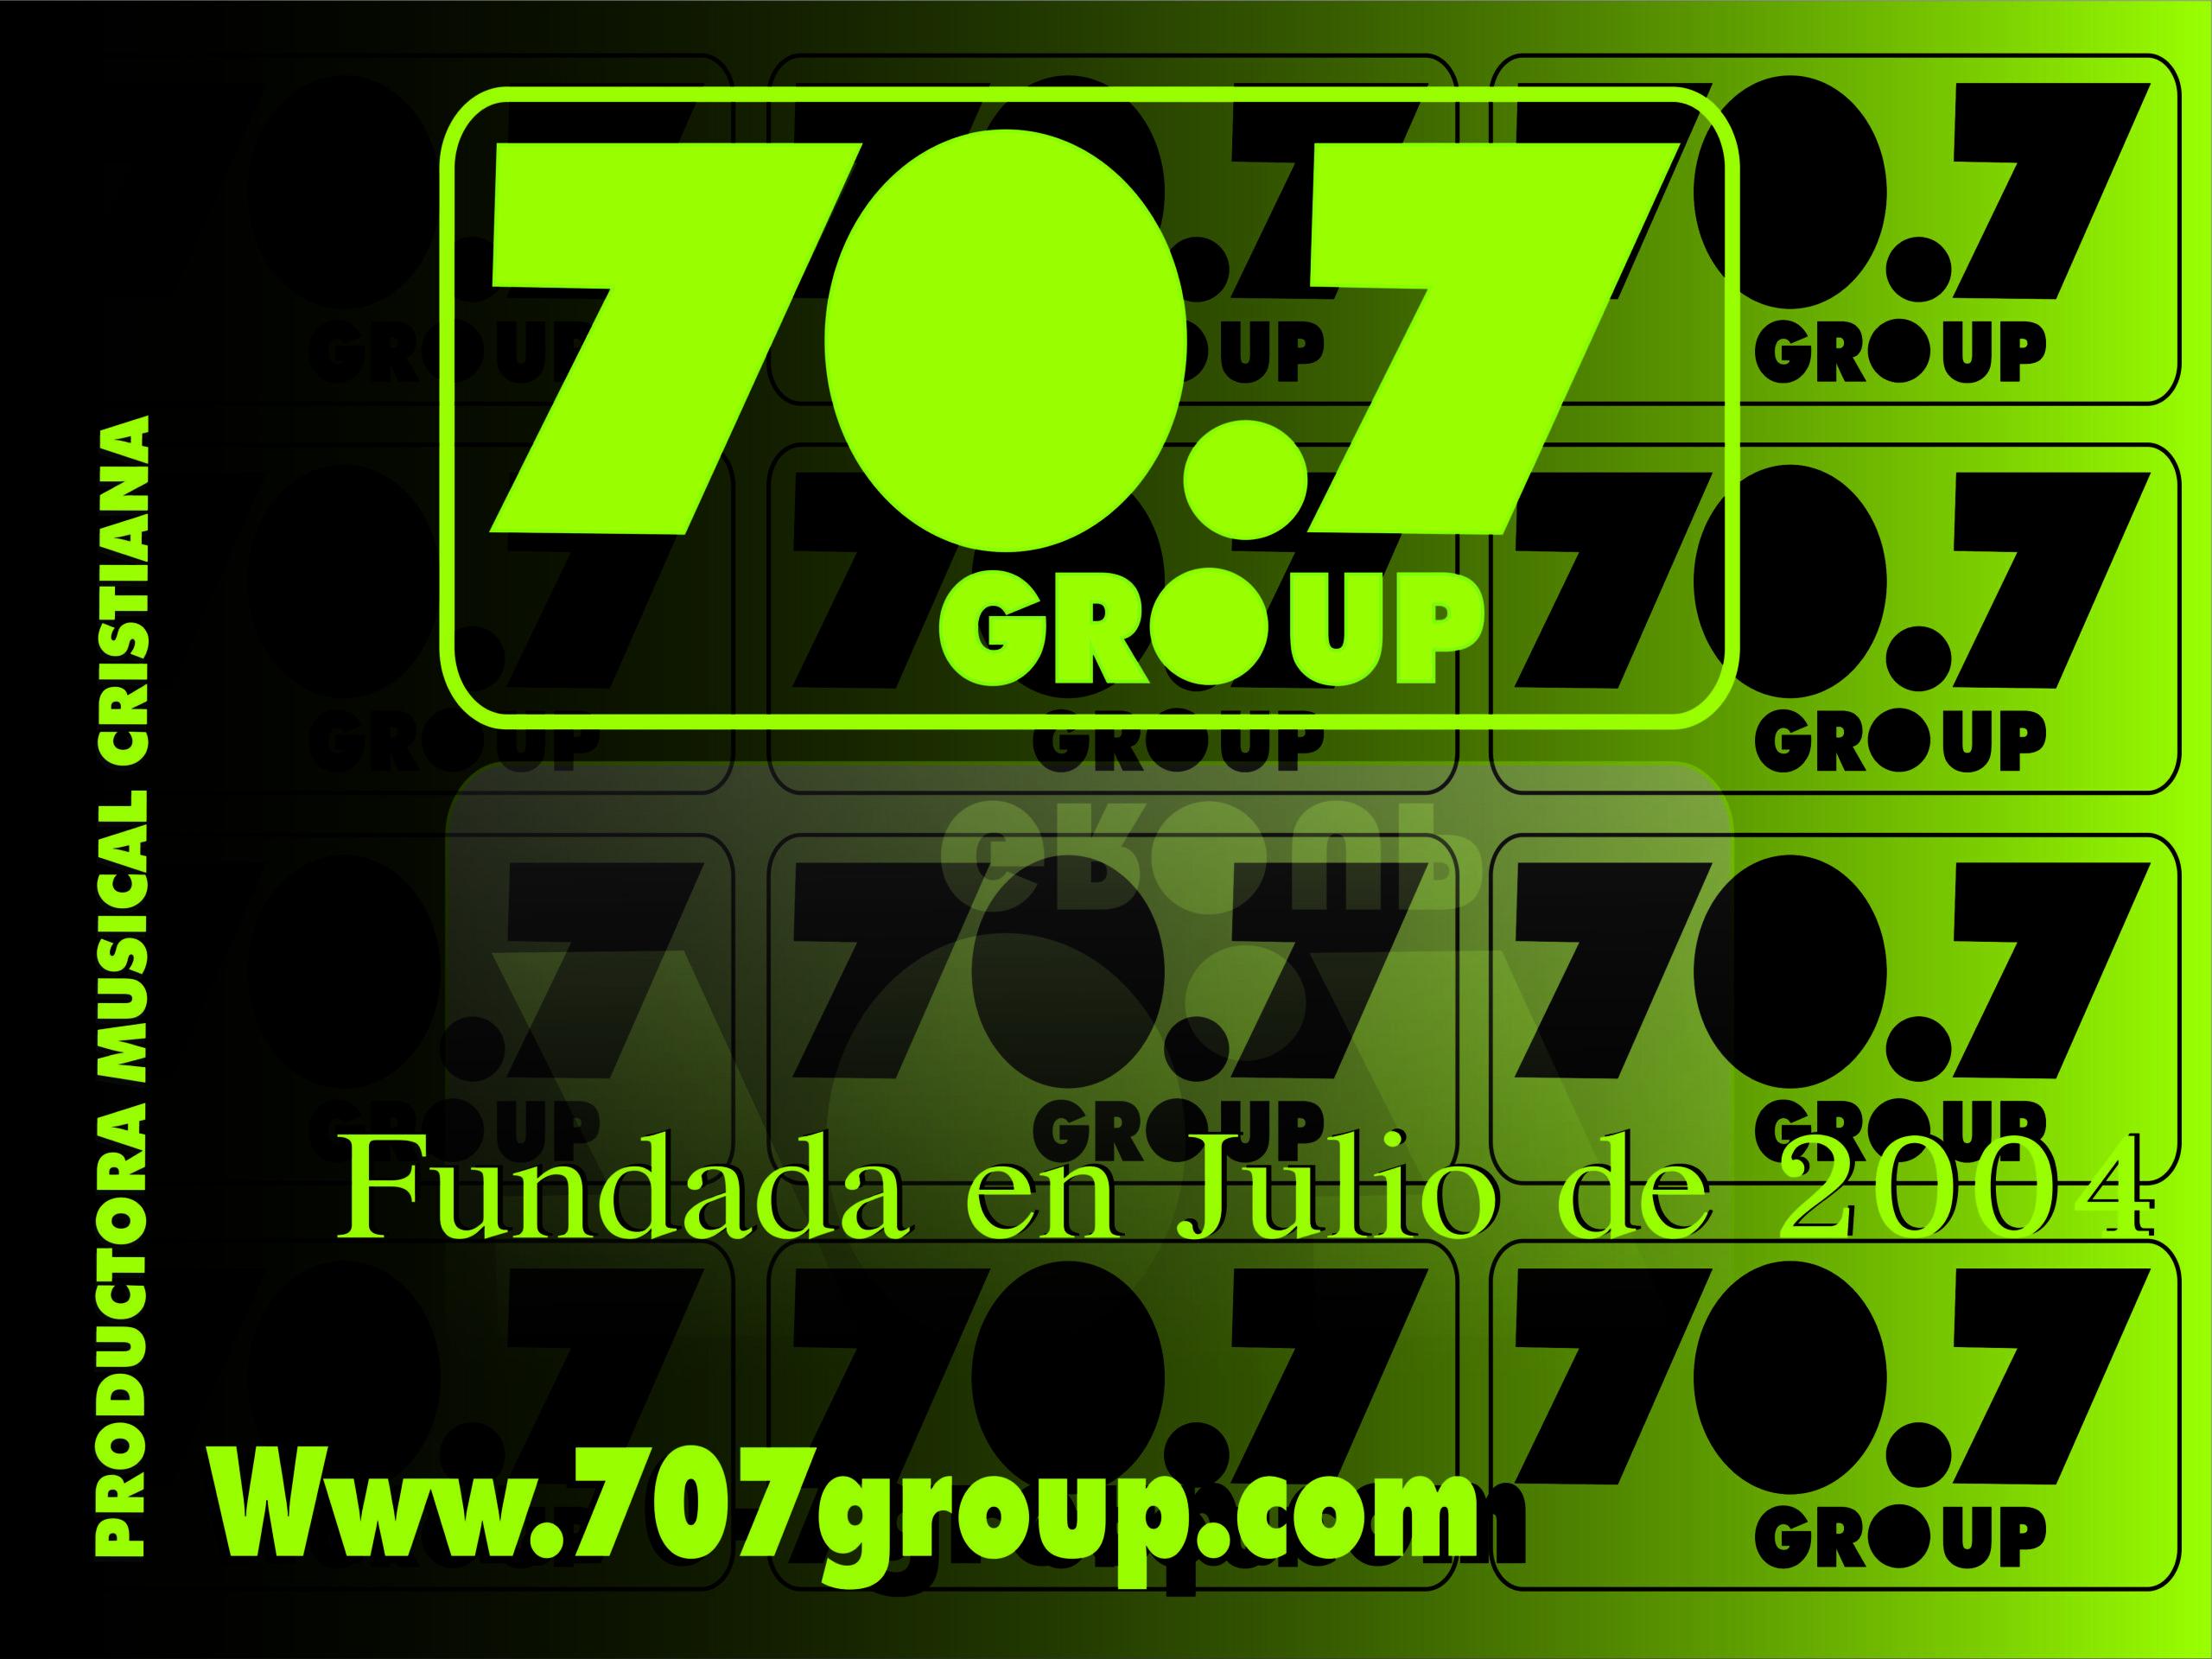 70.7 Group